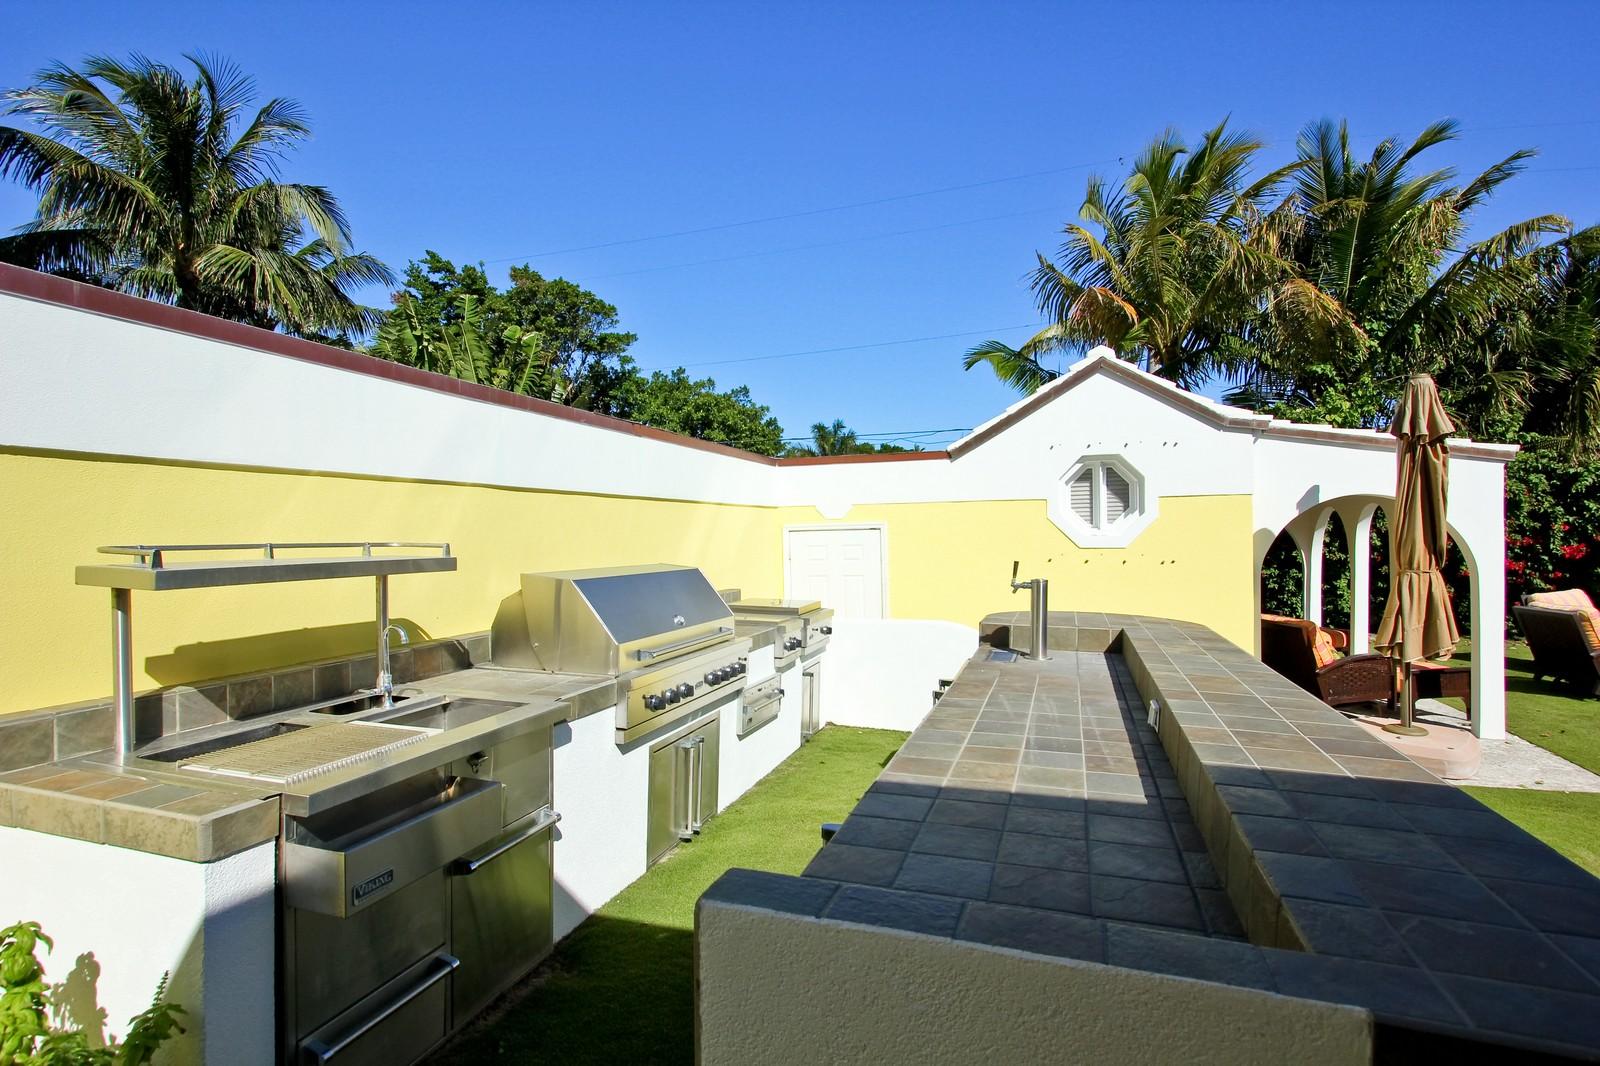 Real Estate Photography - 301 Garden Rd, Palm Beach, FL, 33480 - Location 1